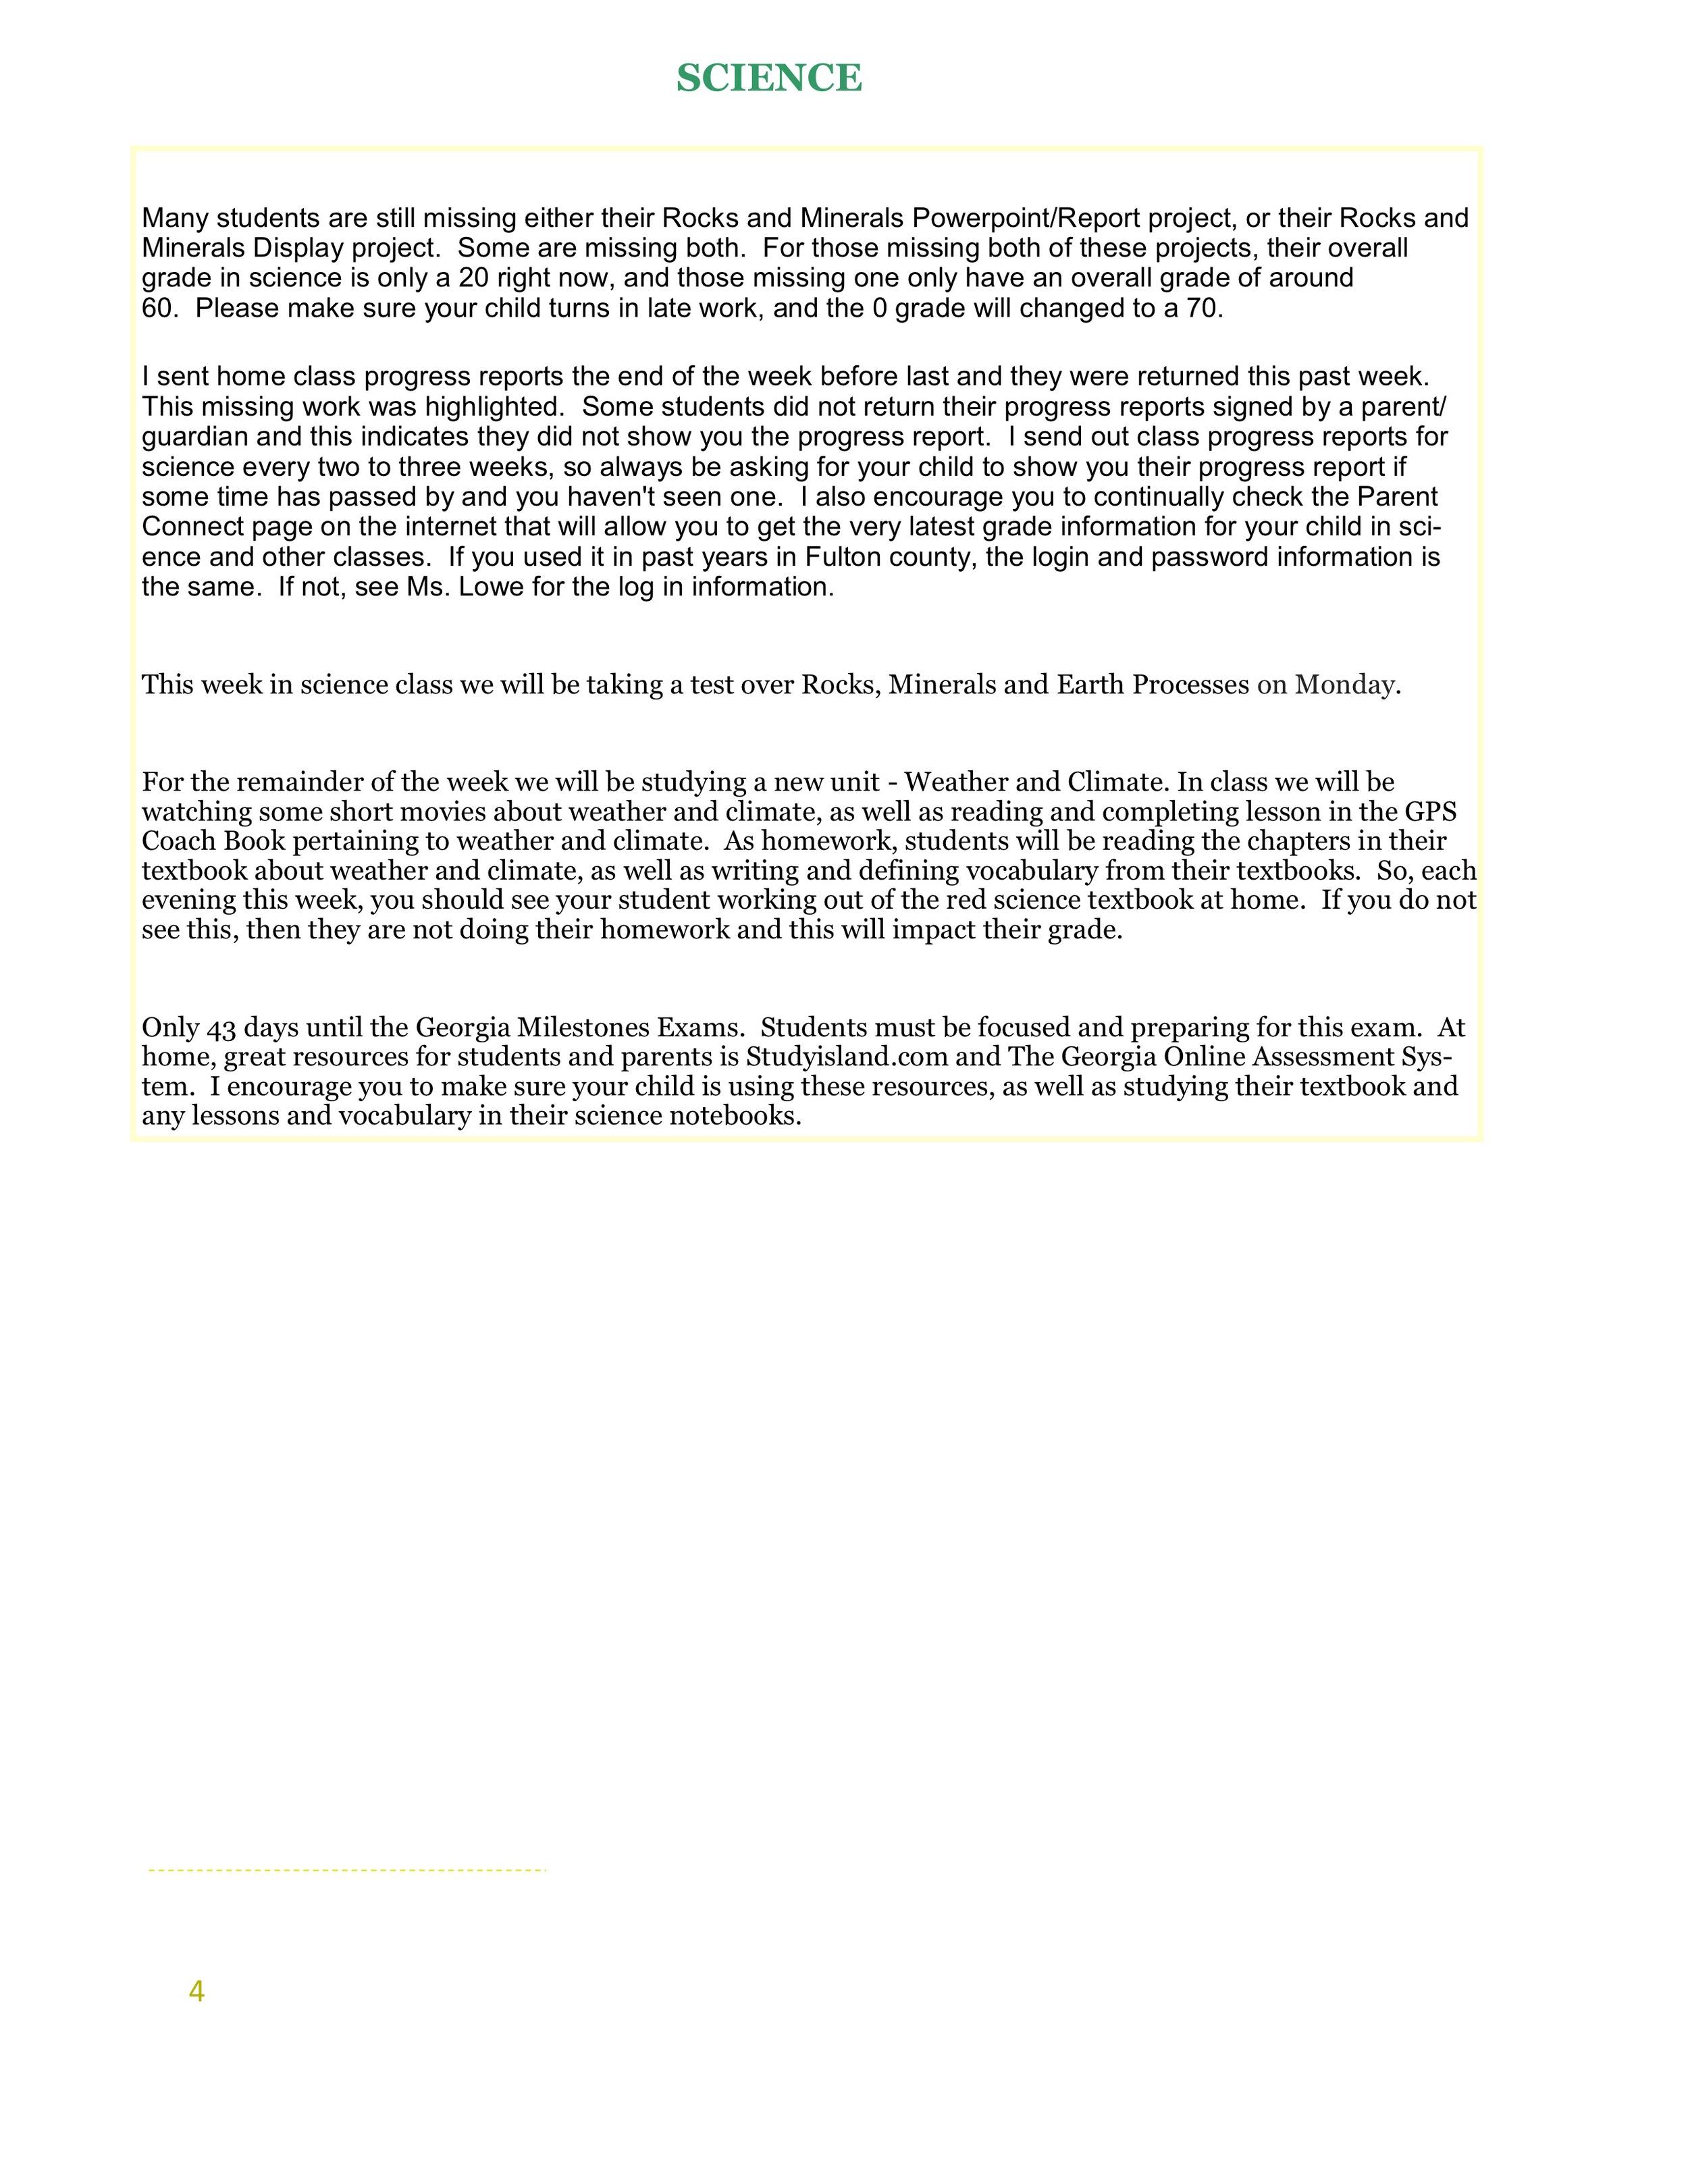 Newsletter ImageFebruary 9-13 4.jpeg